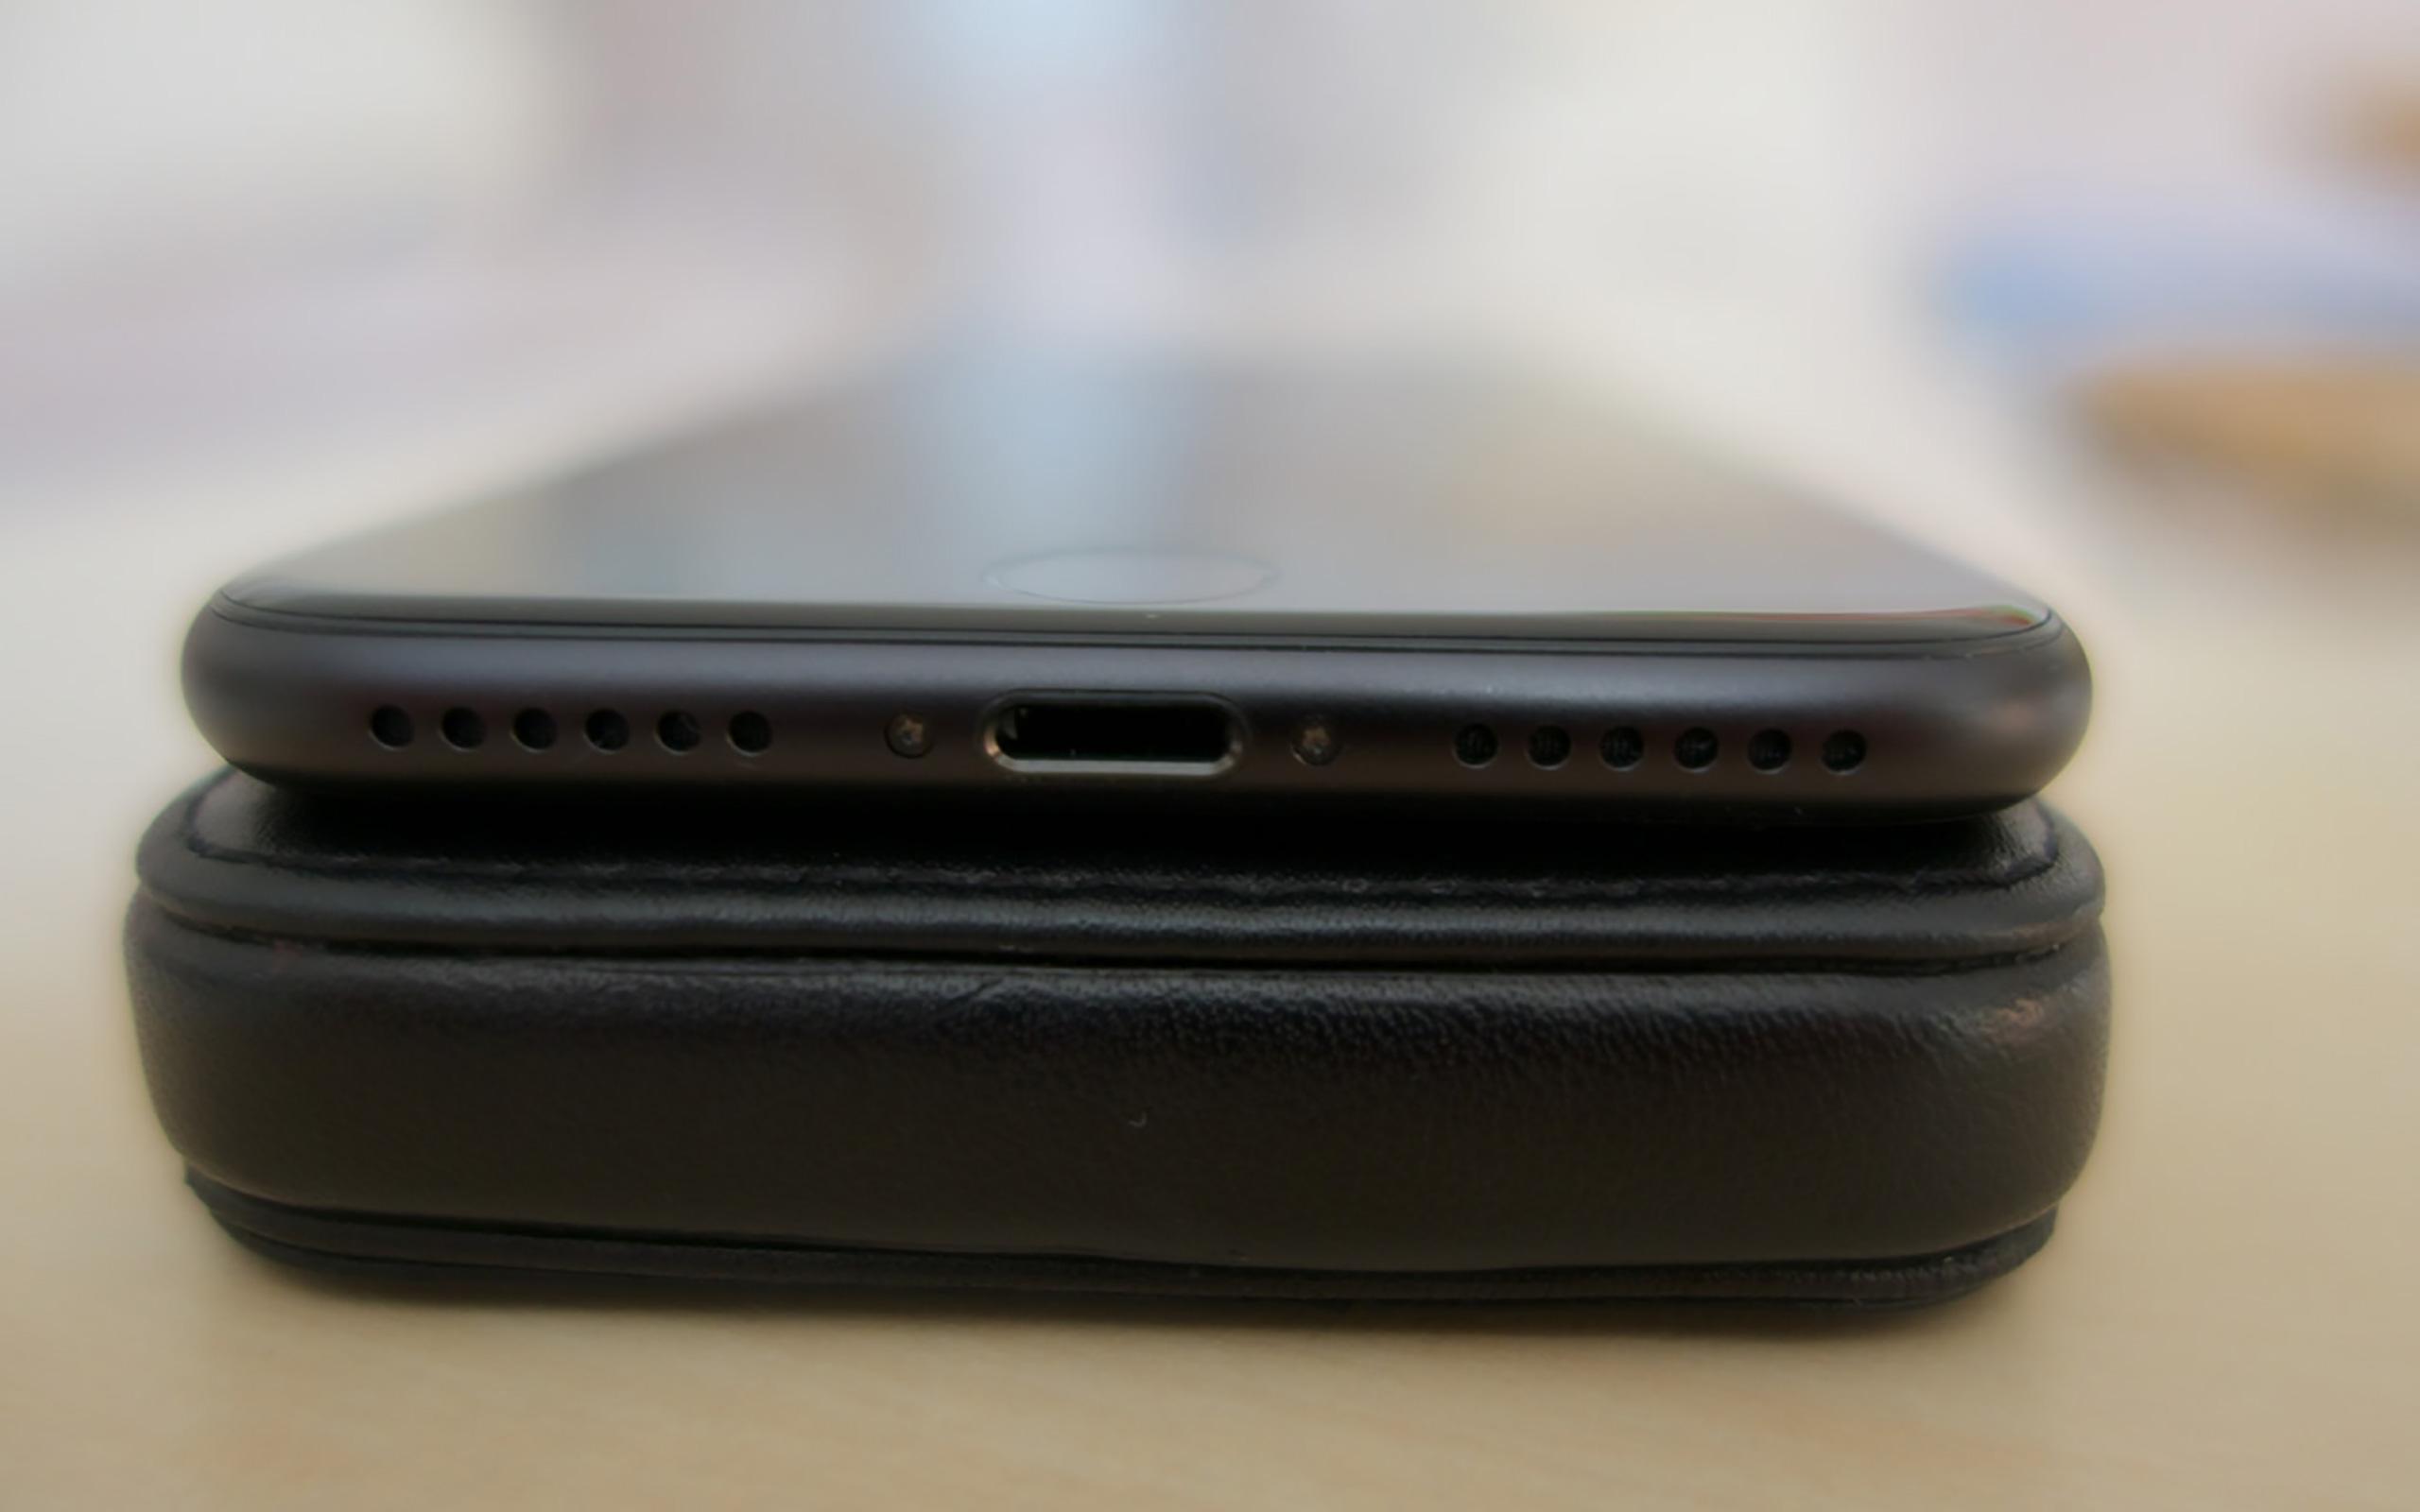 Stereo-Lautsprecher und Lightning-Anschluss beim iPhone 7.